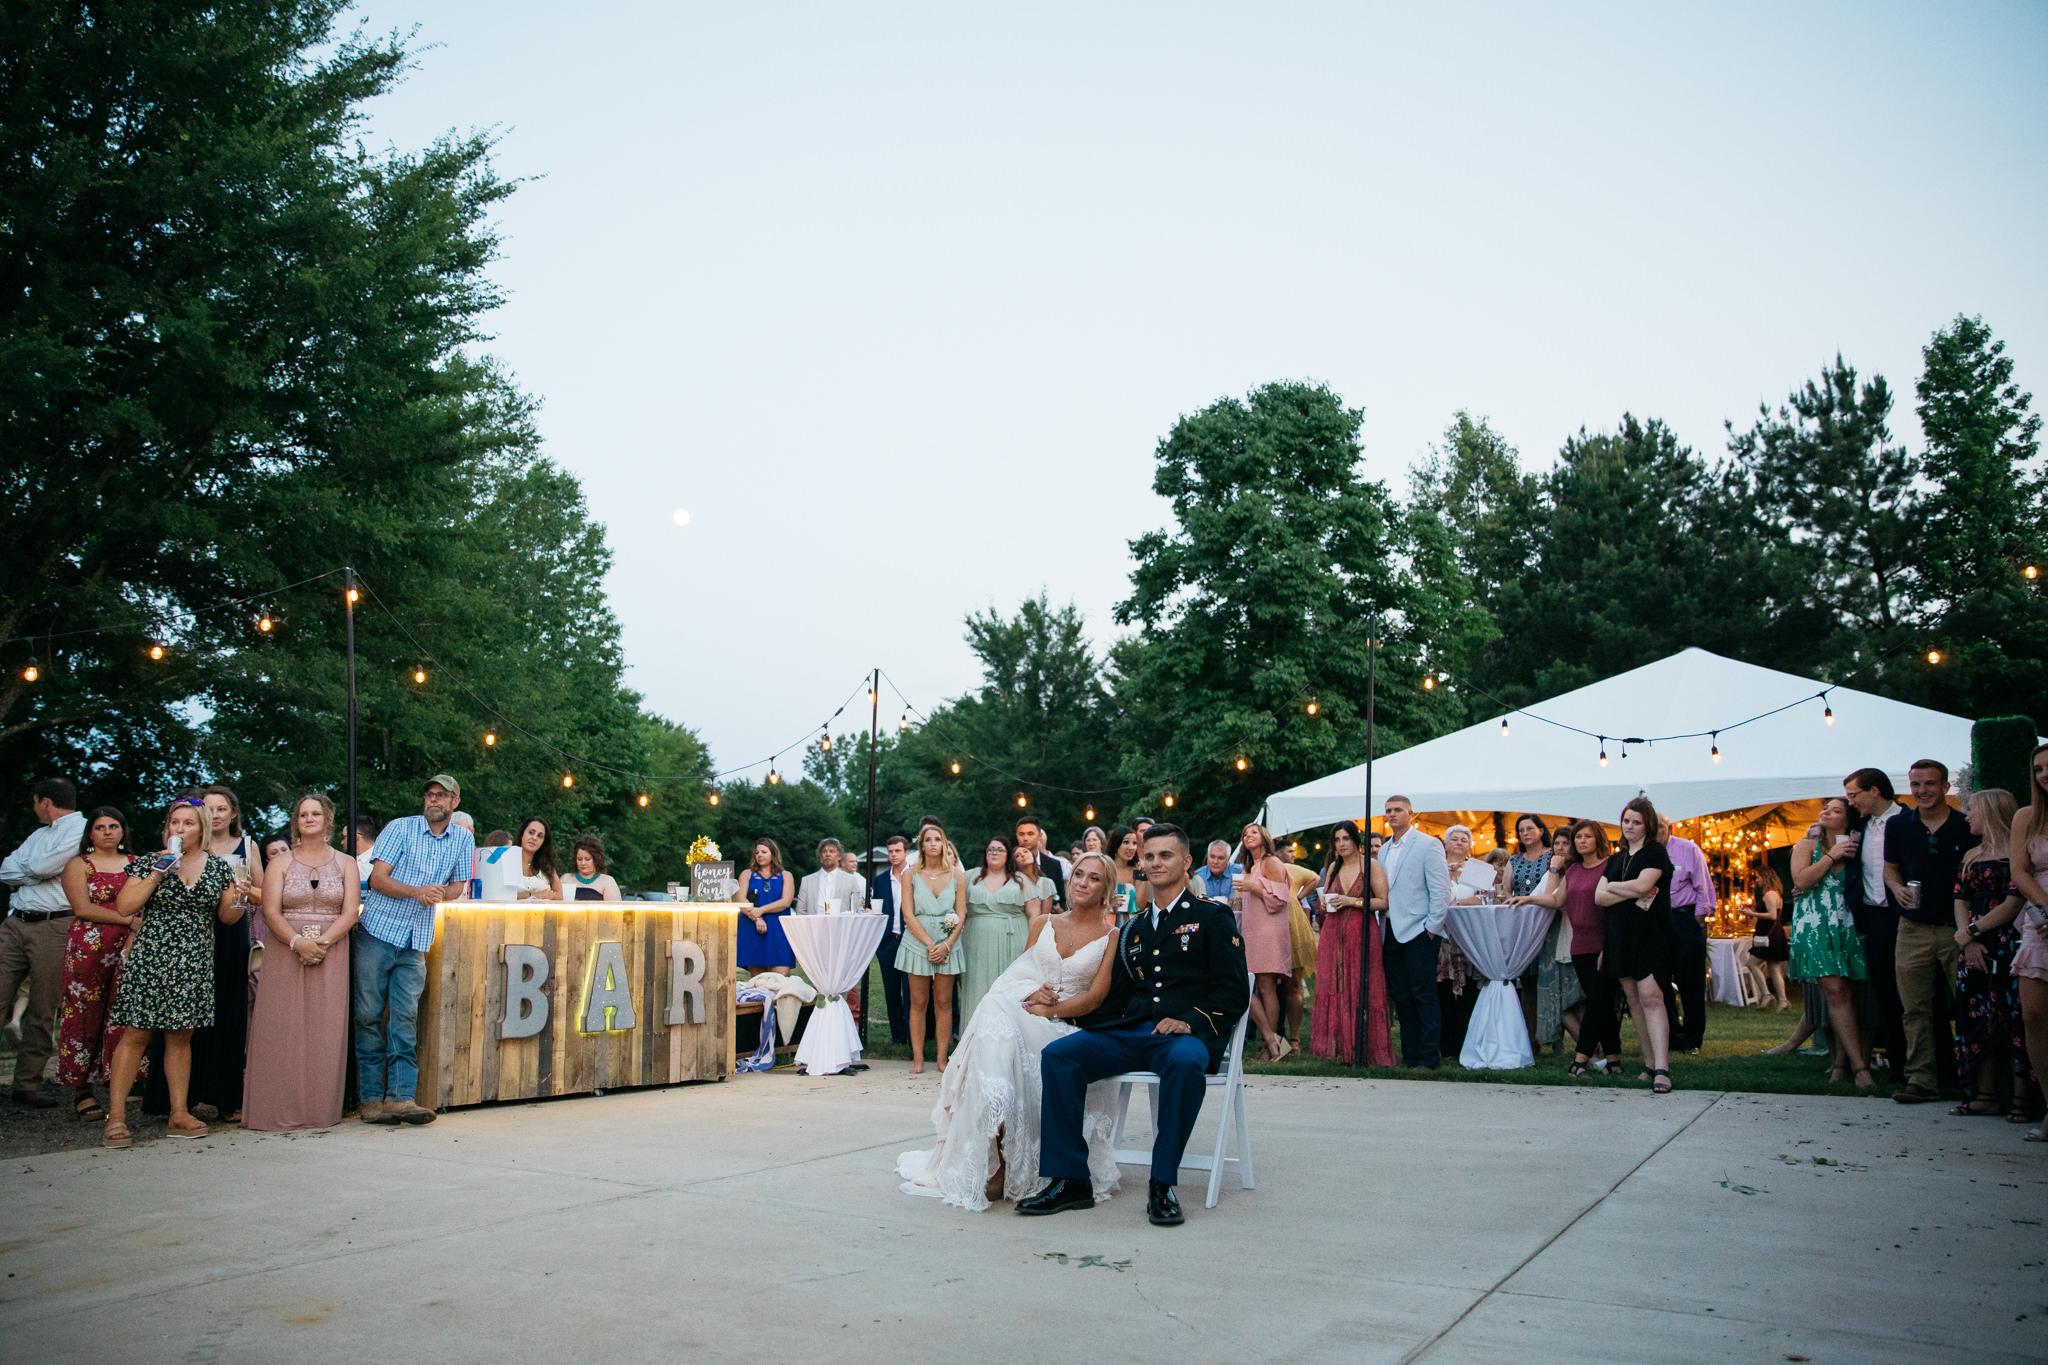 backyard-wedding-thewarmtharoundyou-lexy-branson-41.jpg